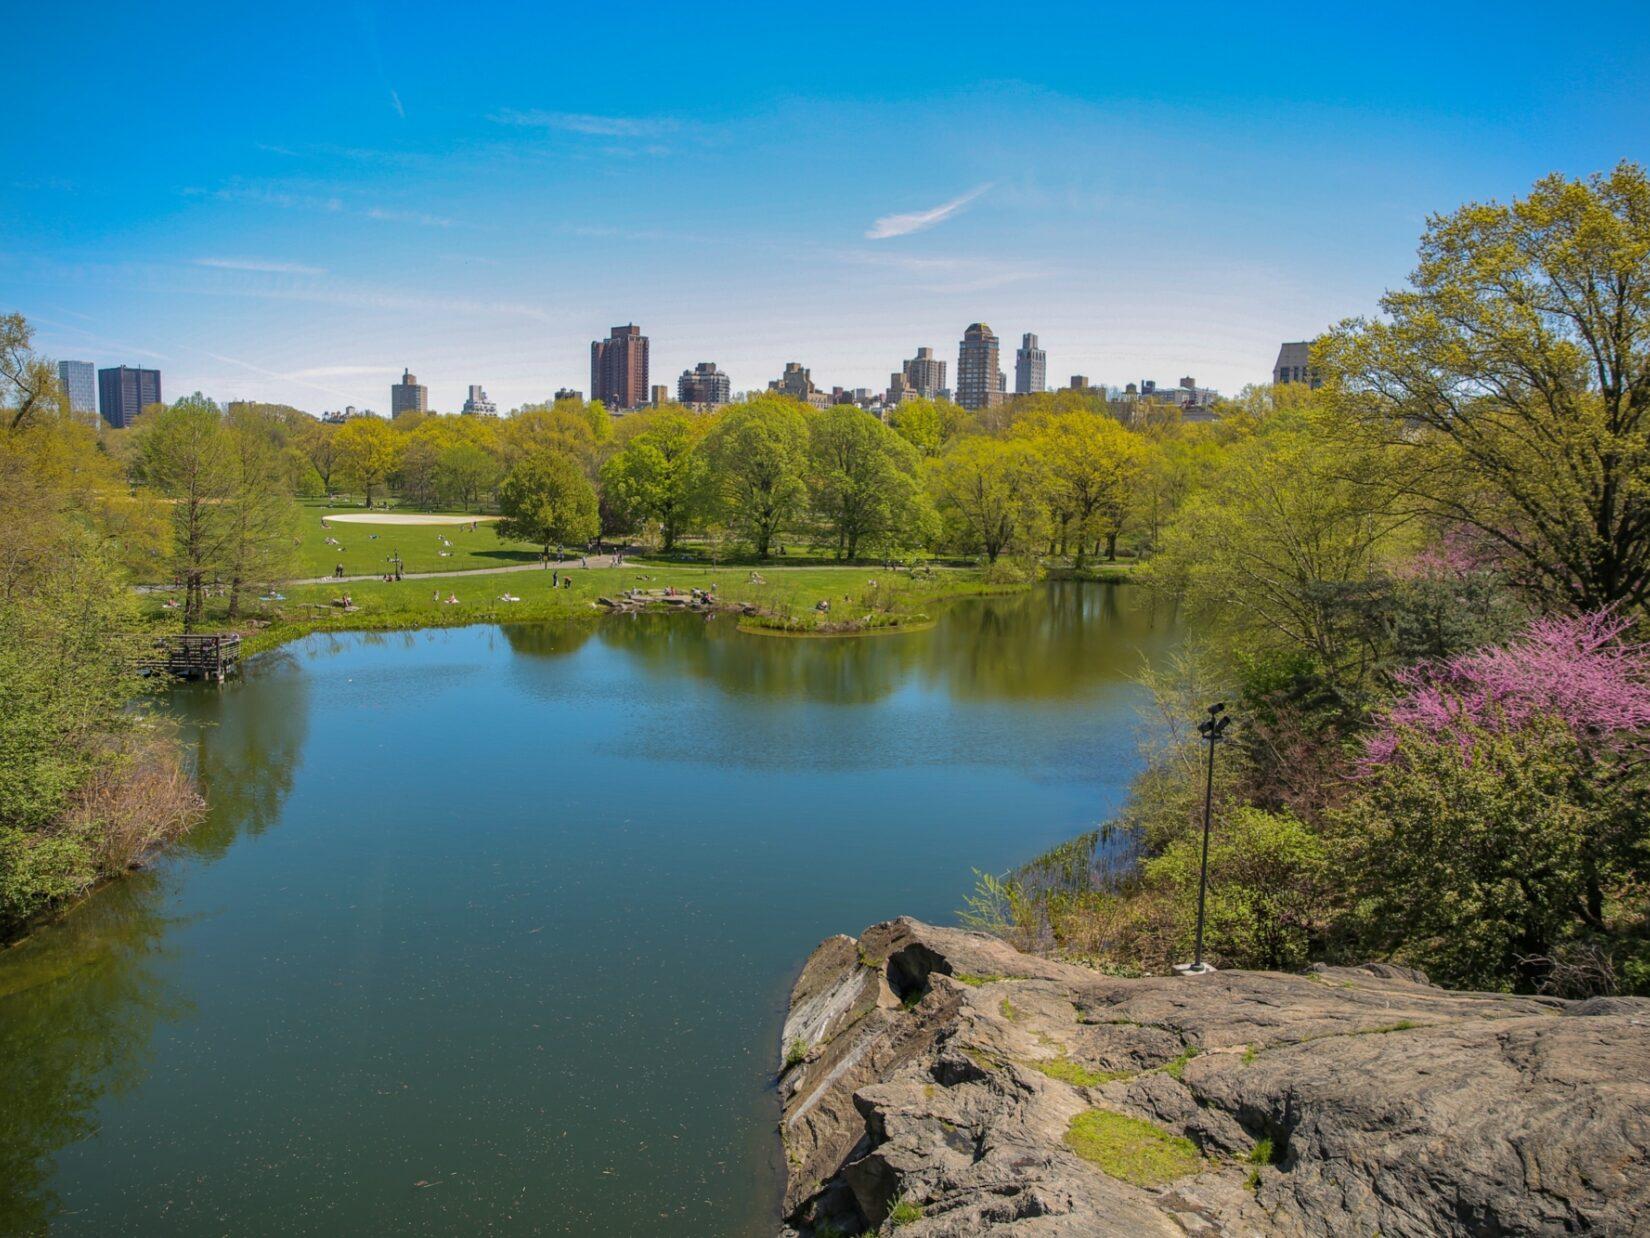 Looking across Turtle Pond toward the East Side of Manhattan